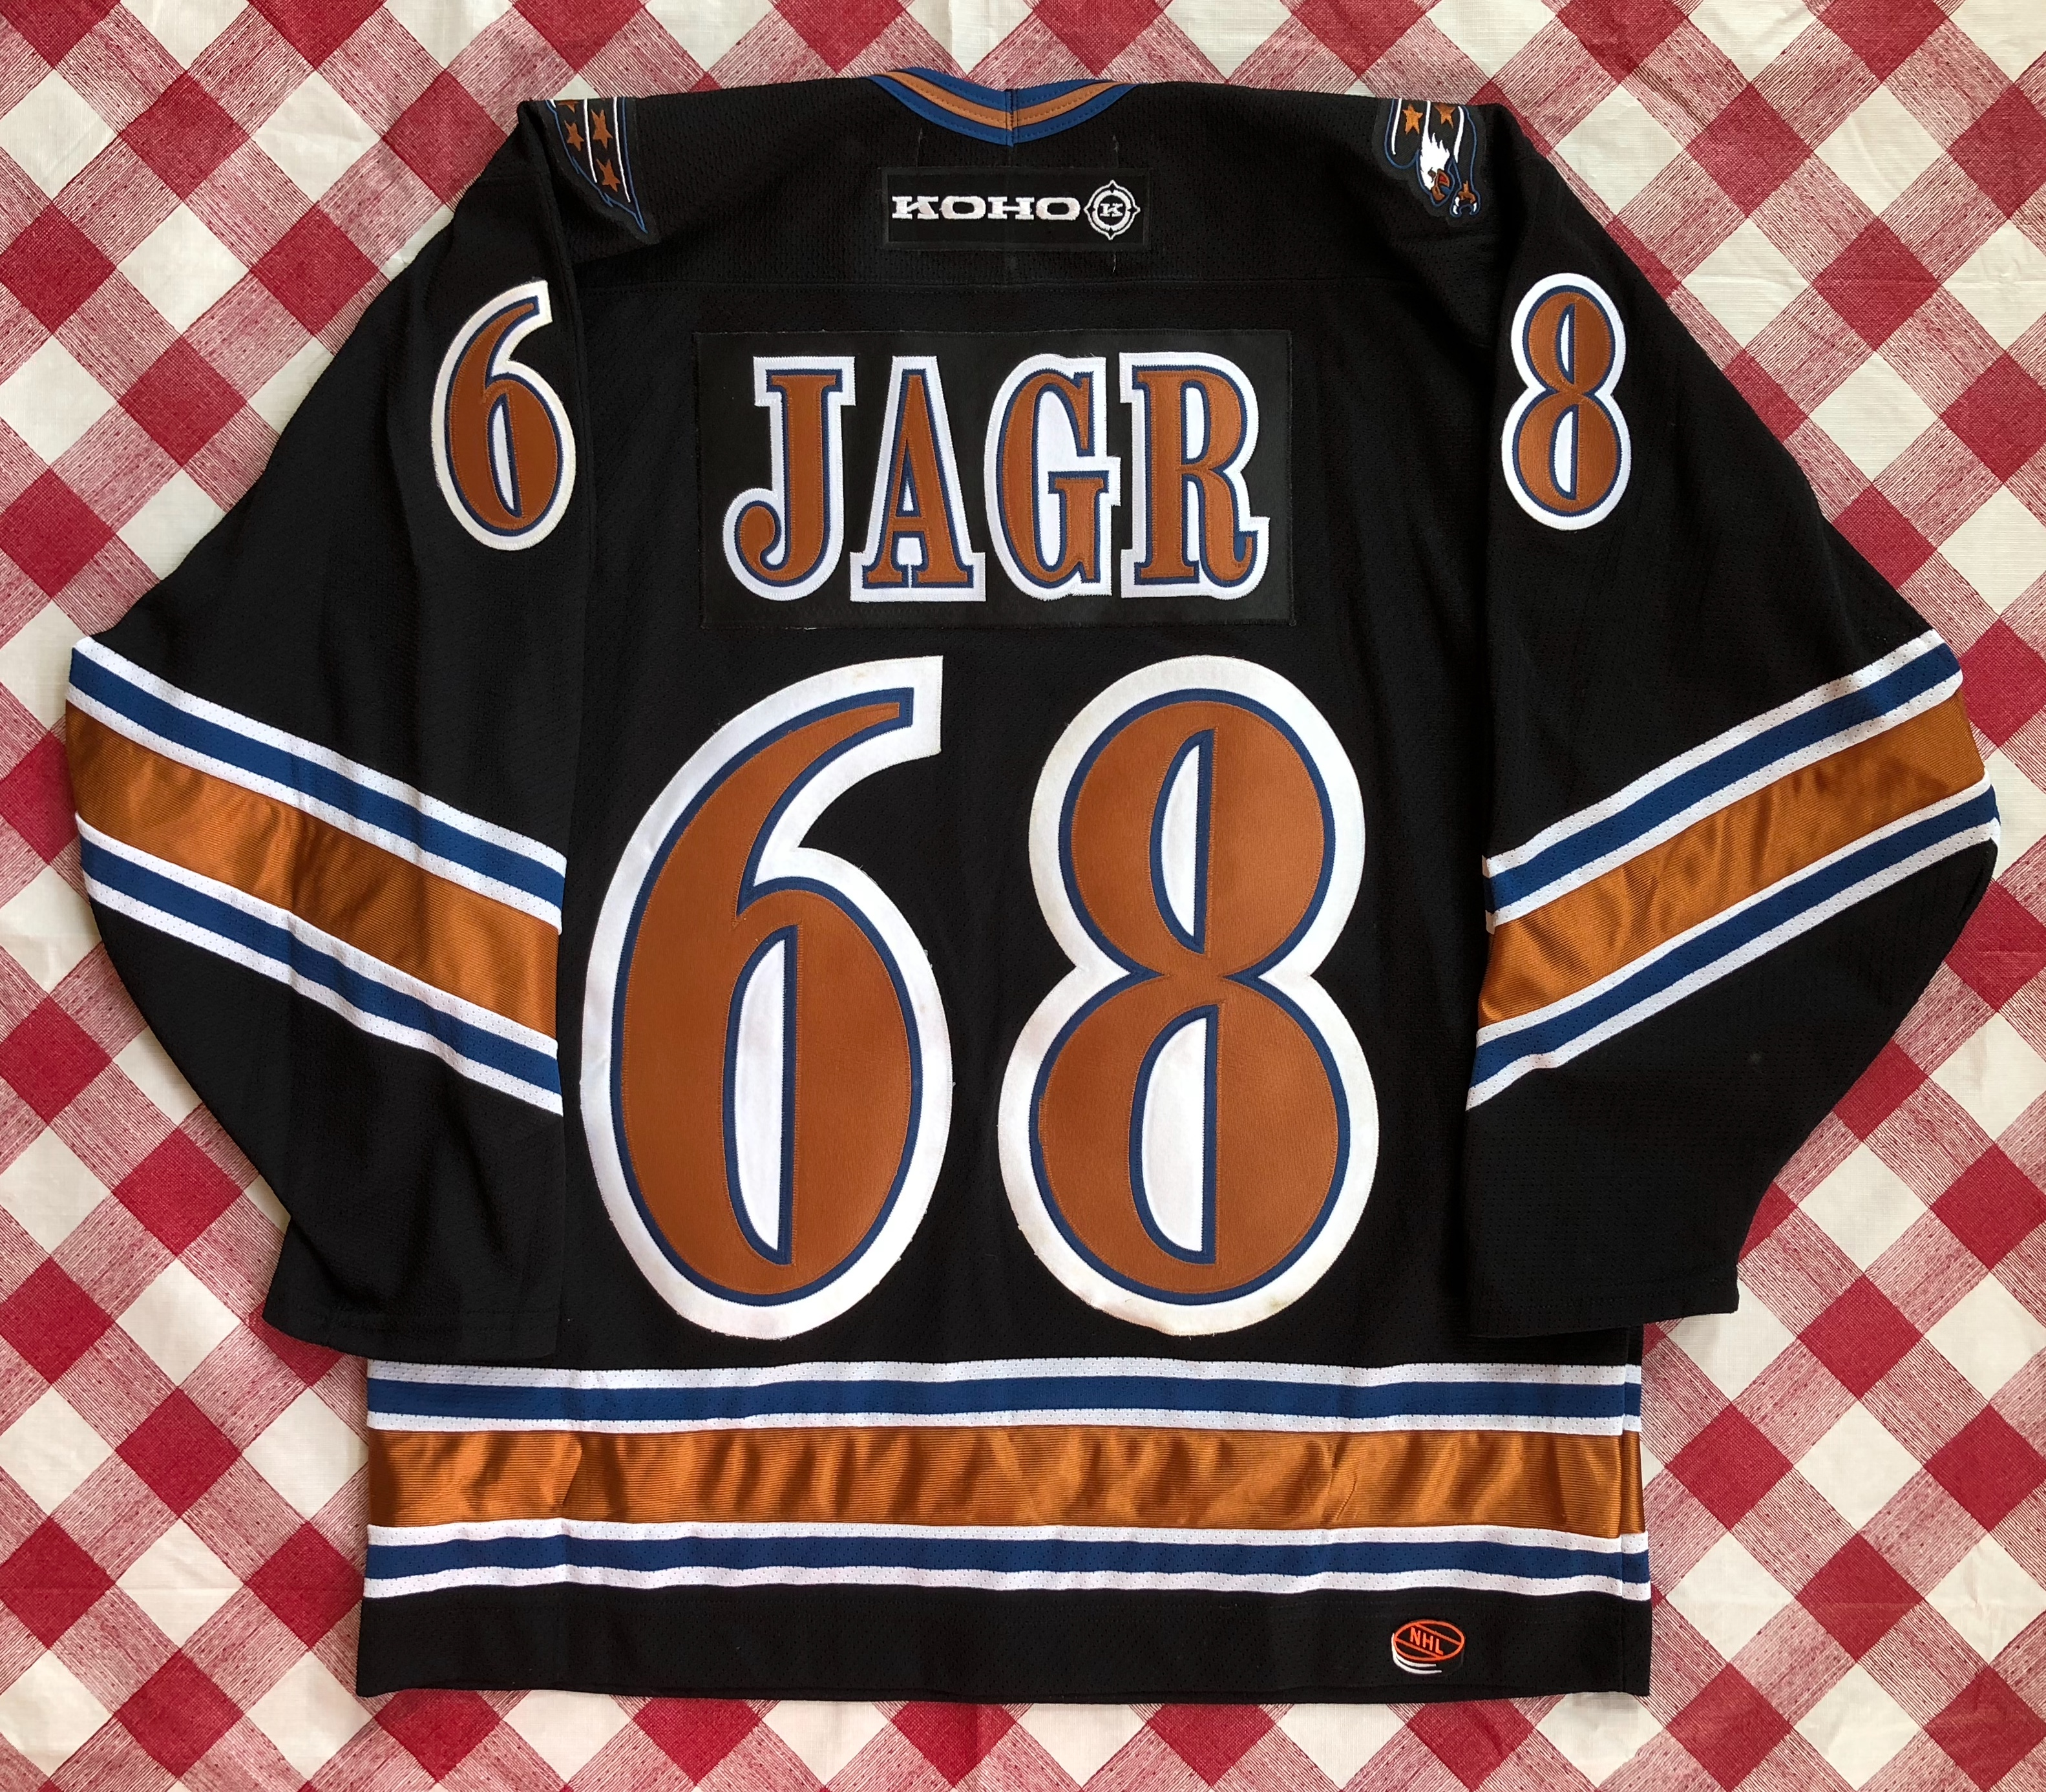 206eca5ce51 2001 Jaromir Jagr Washington Capitals Koho NHL Jersey Size Large ...